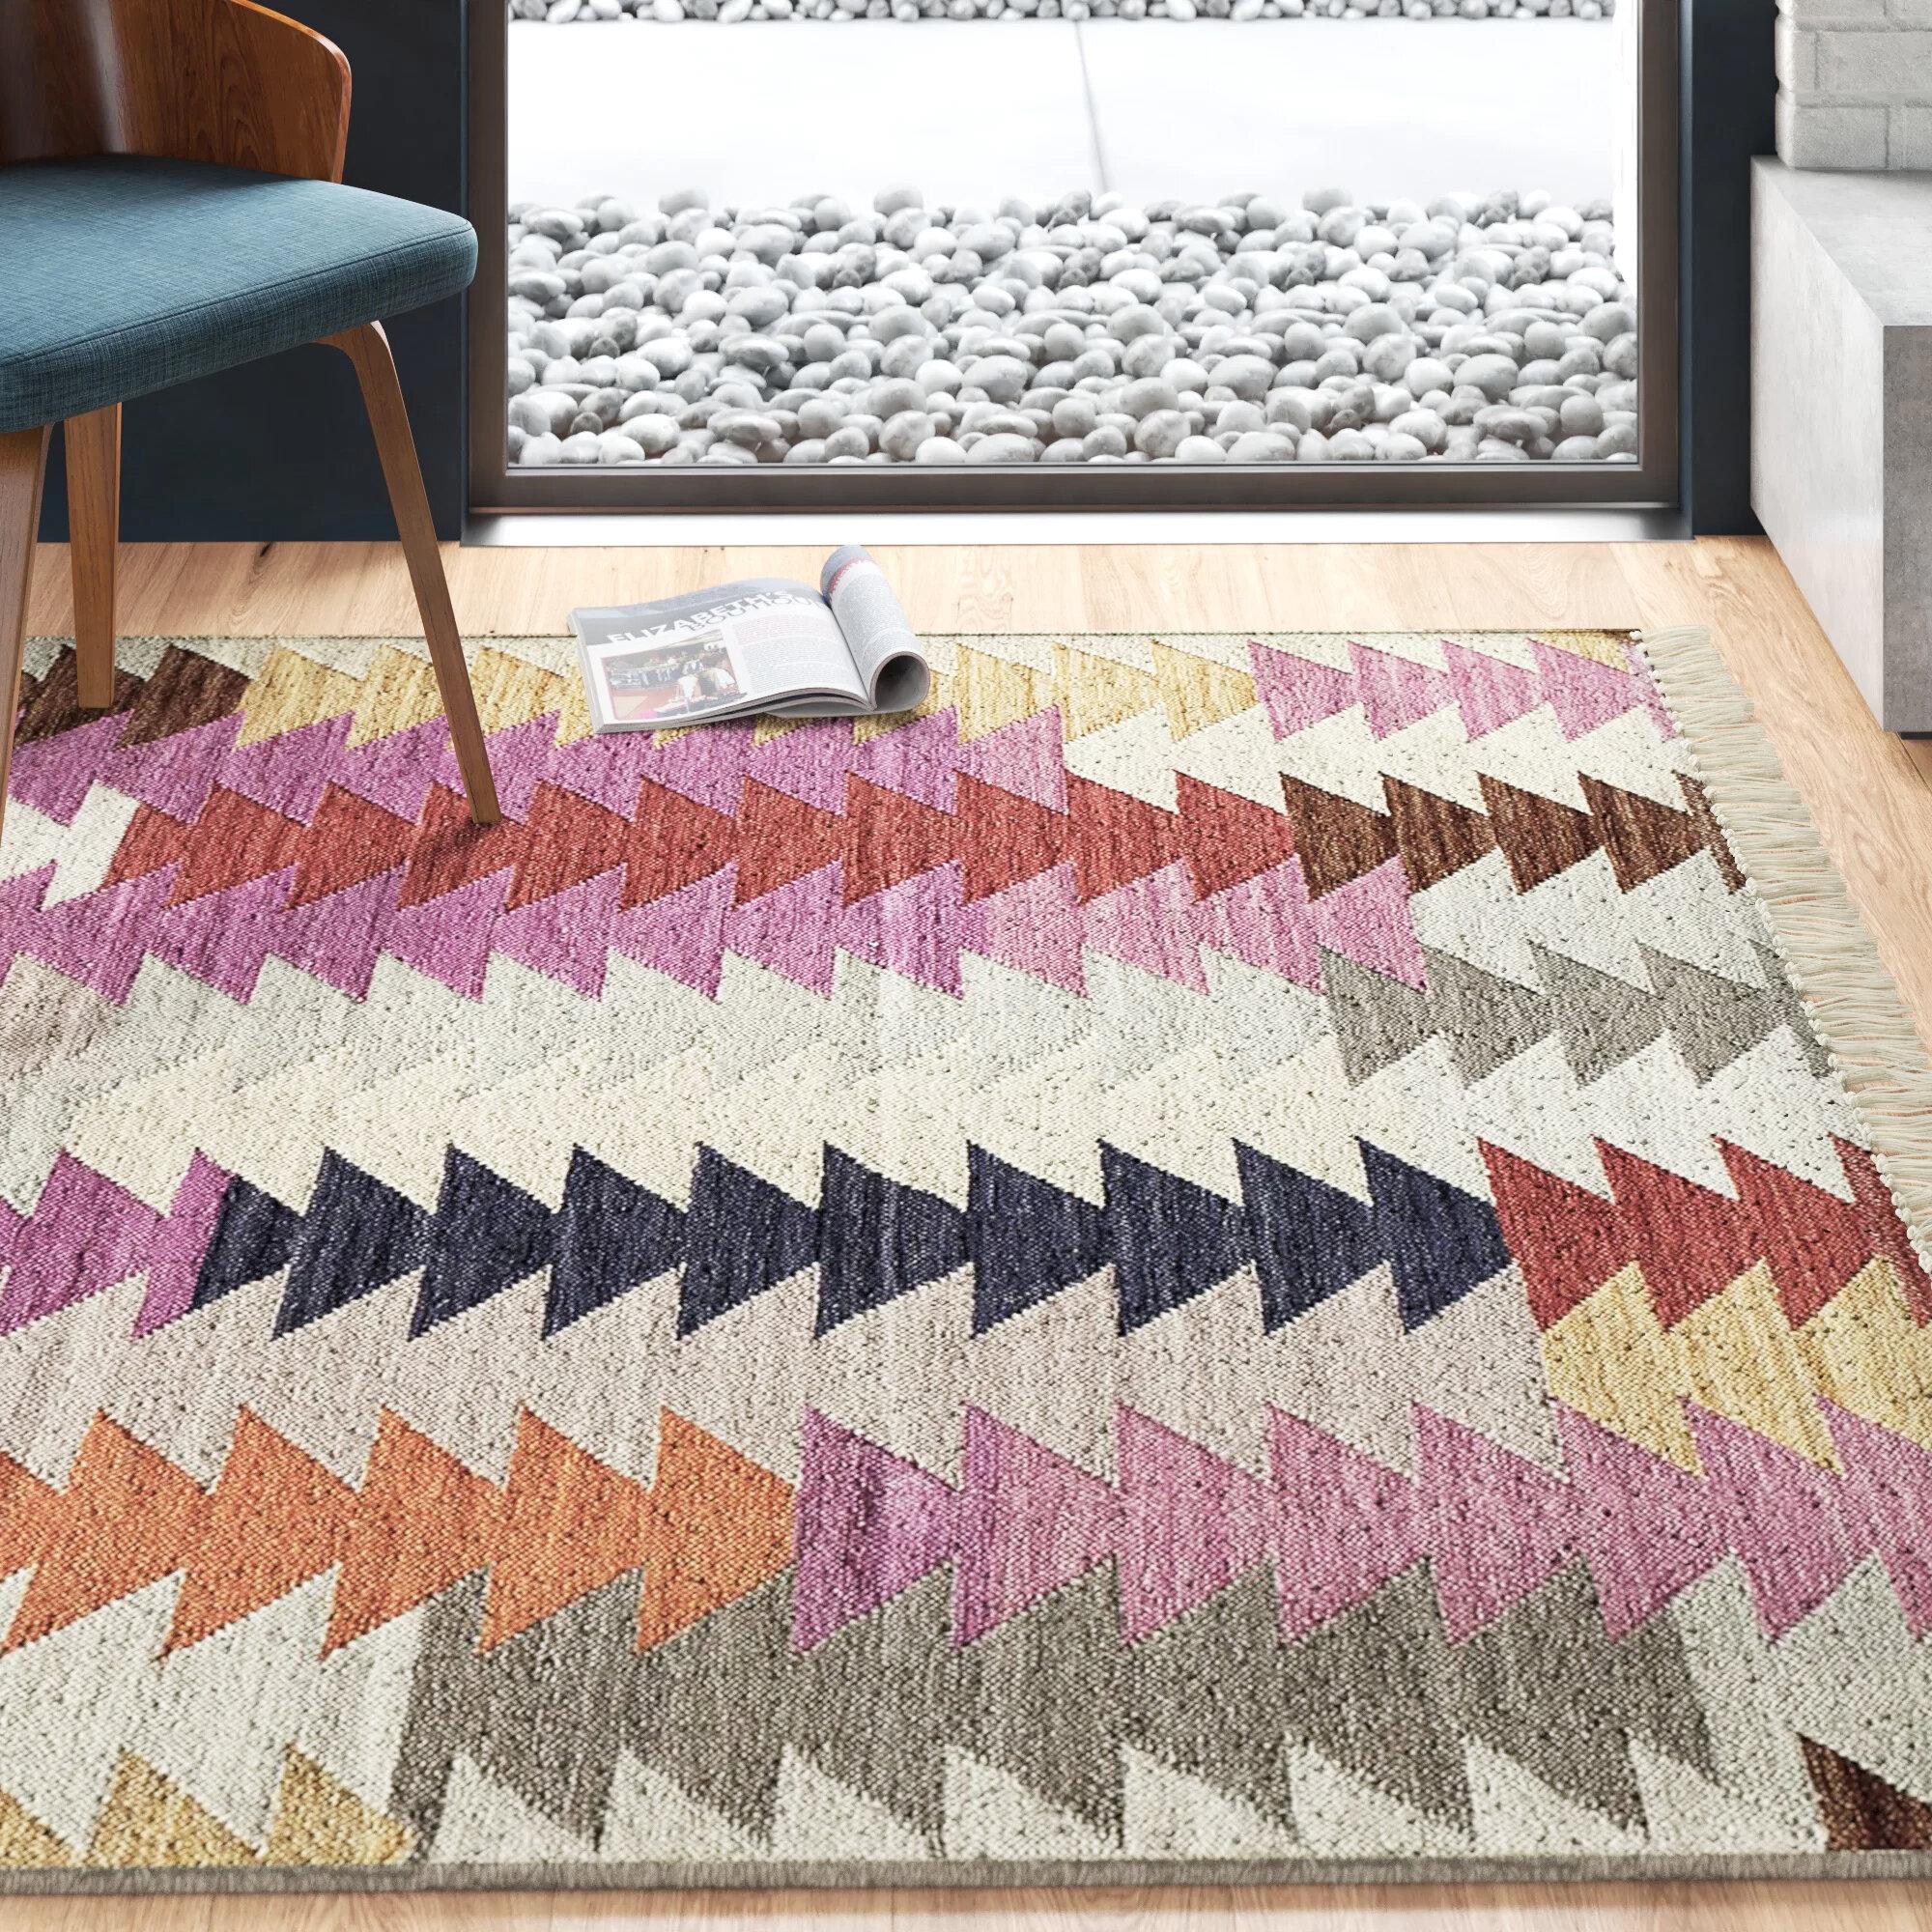 Raya Handwoven Wool Gray Pink Blue Area Rug Reviews Allmodern